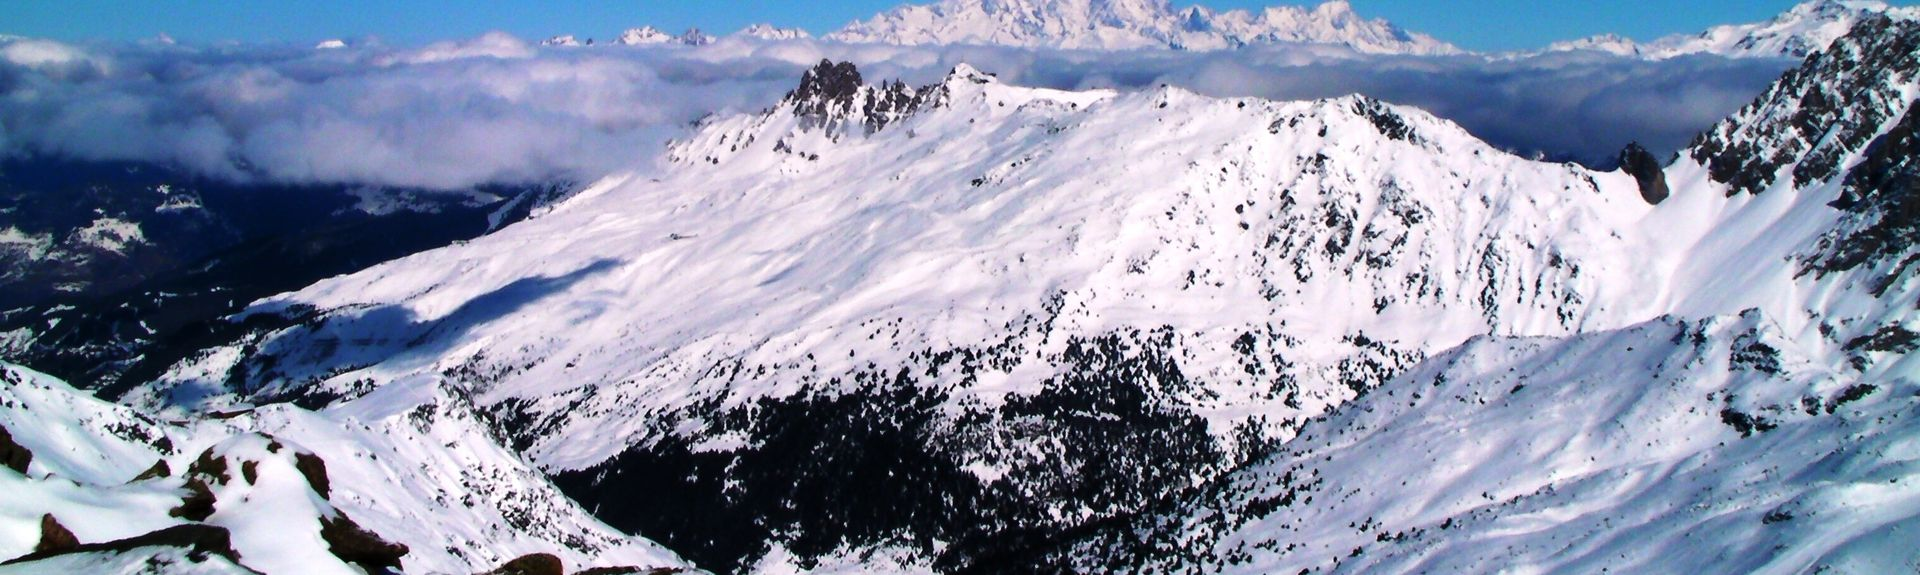 Montalbert, Aime, Rhône-Alpes, Frankreich